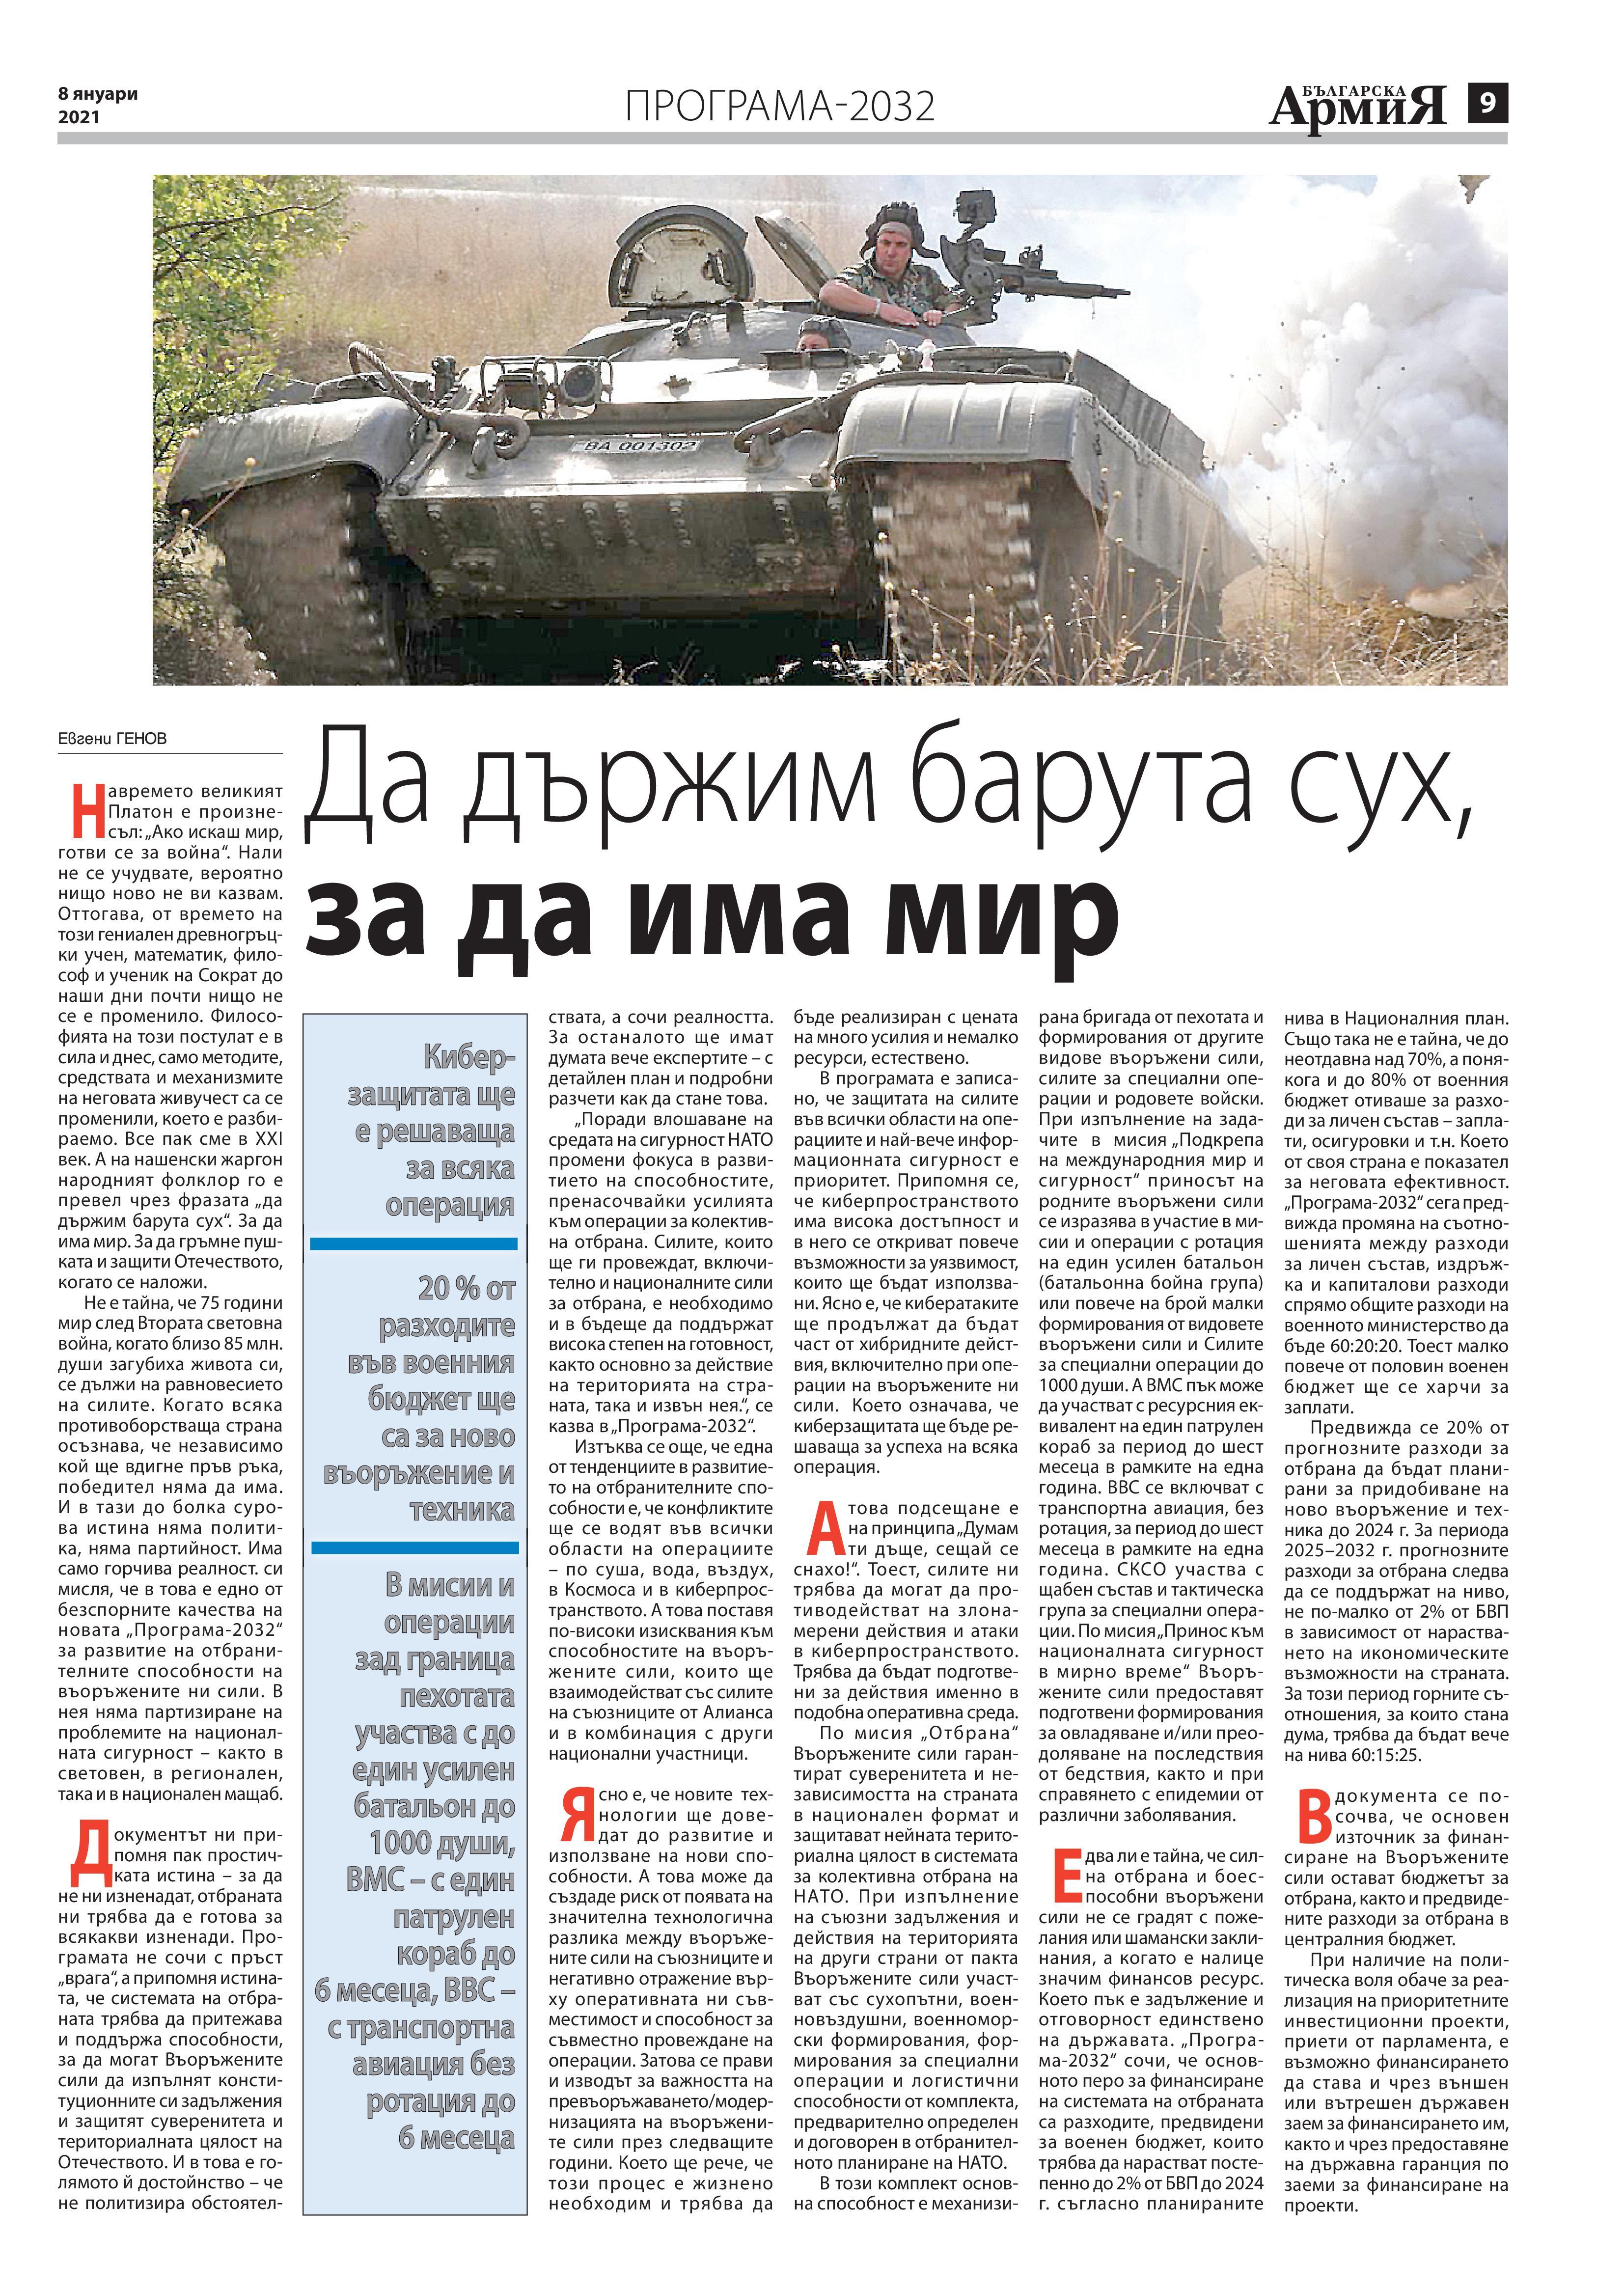 https://armymedia.bg/wp-content/uploads/2015/06/09-54.jpg